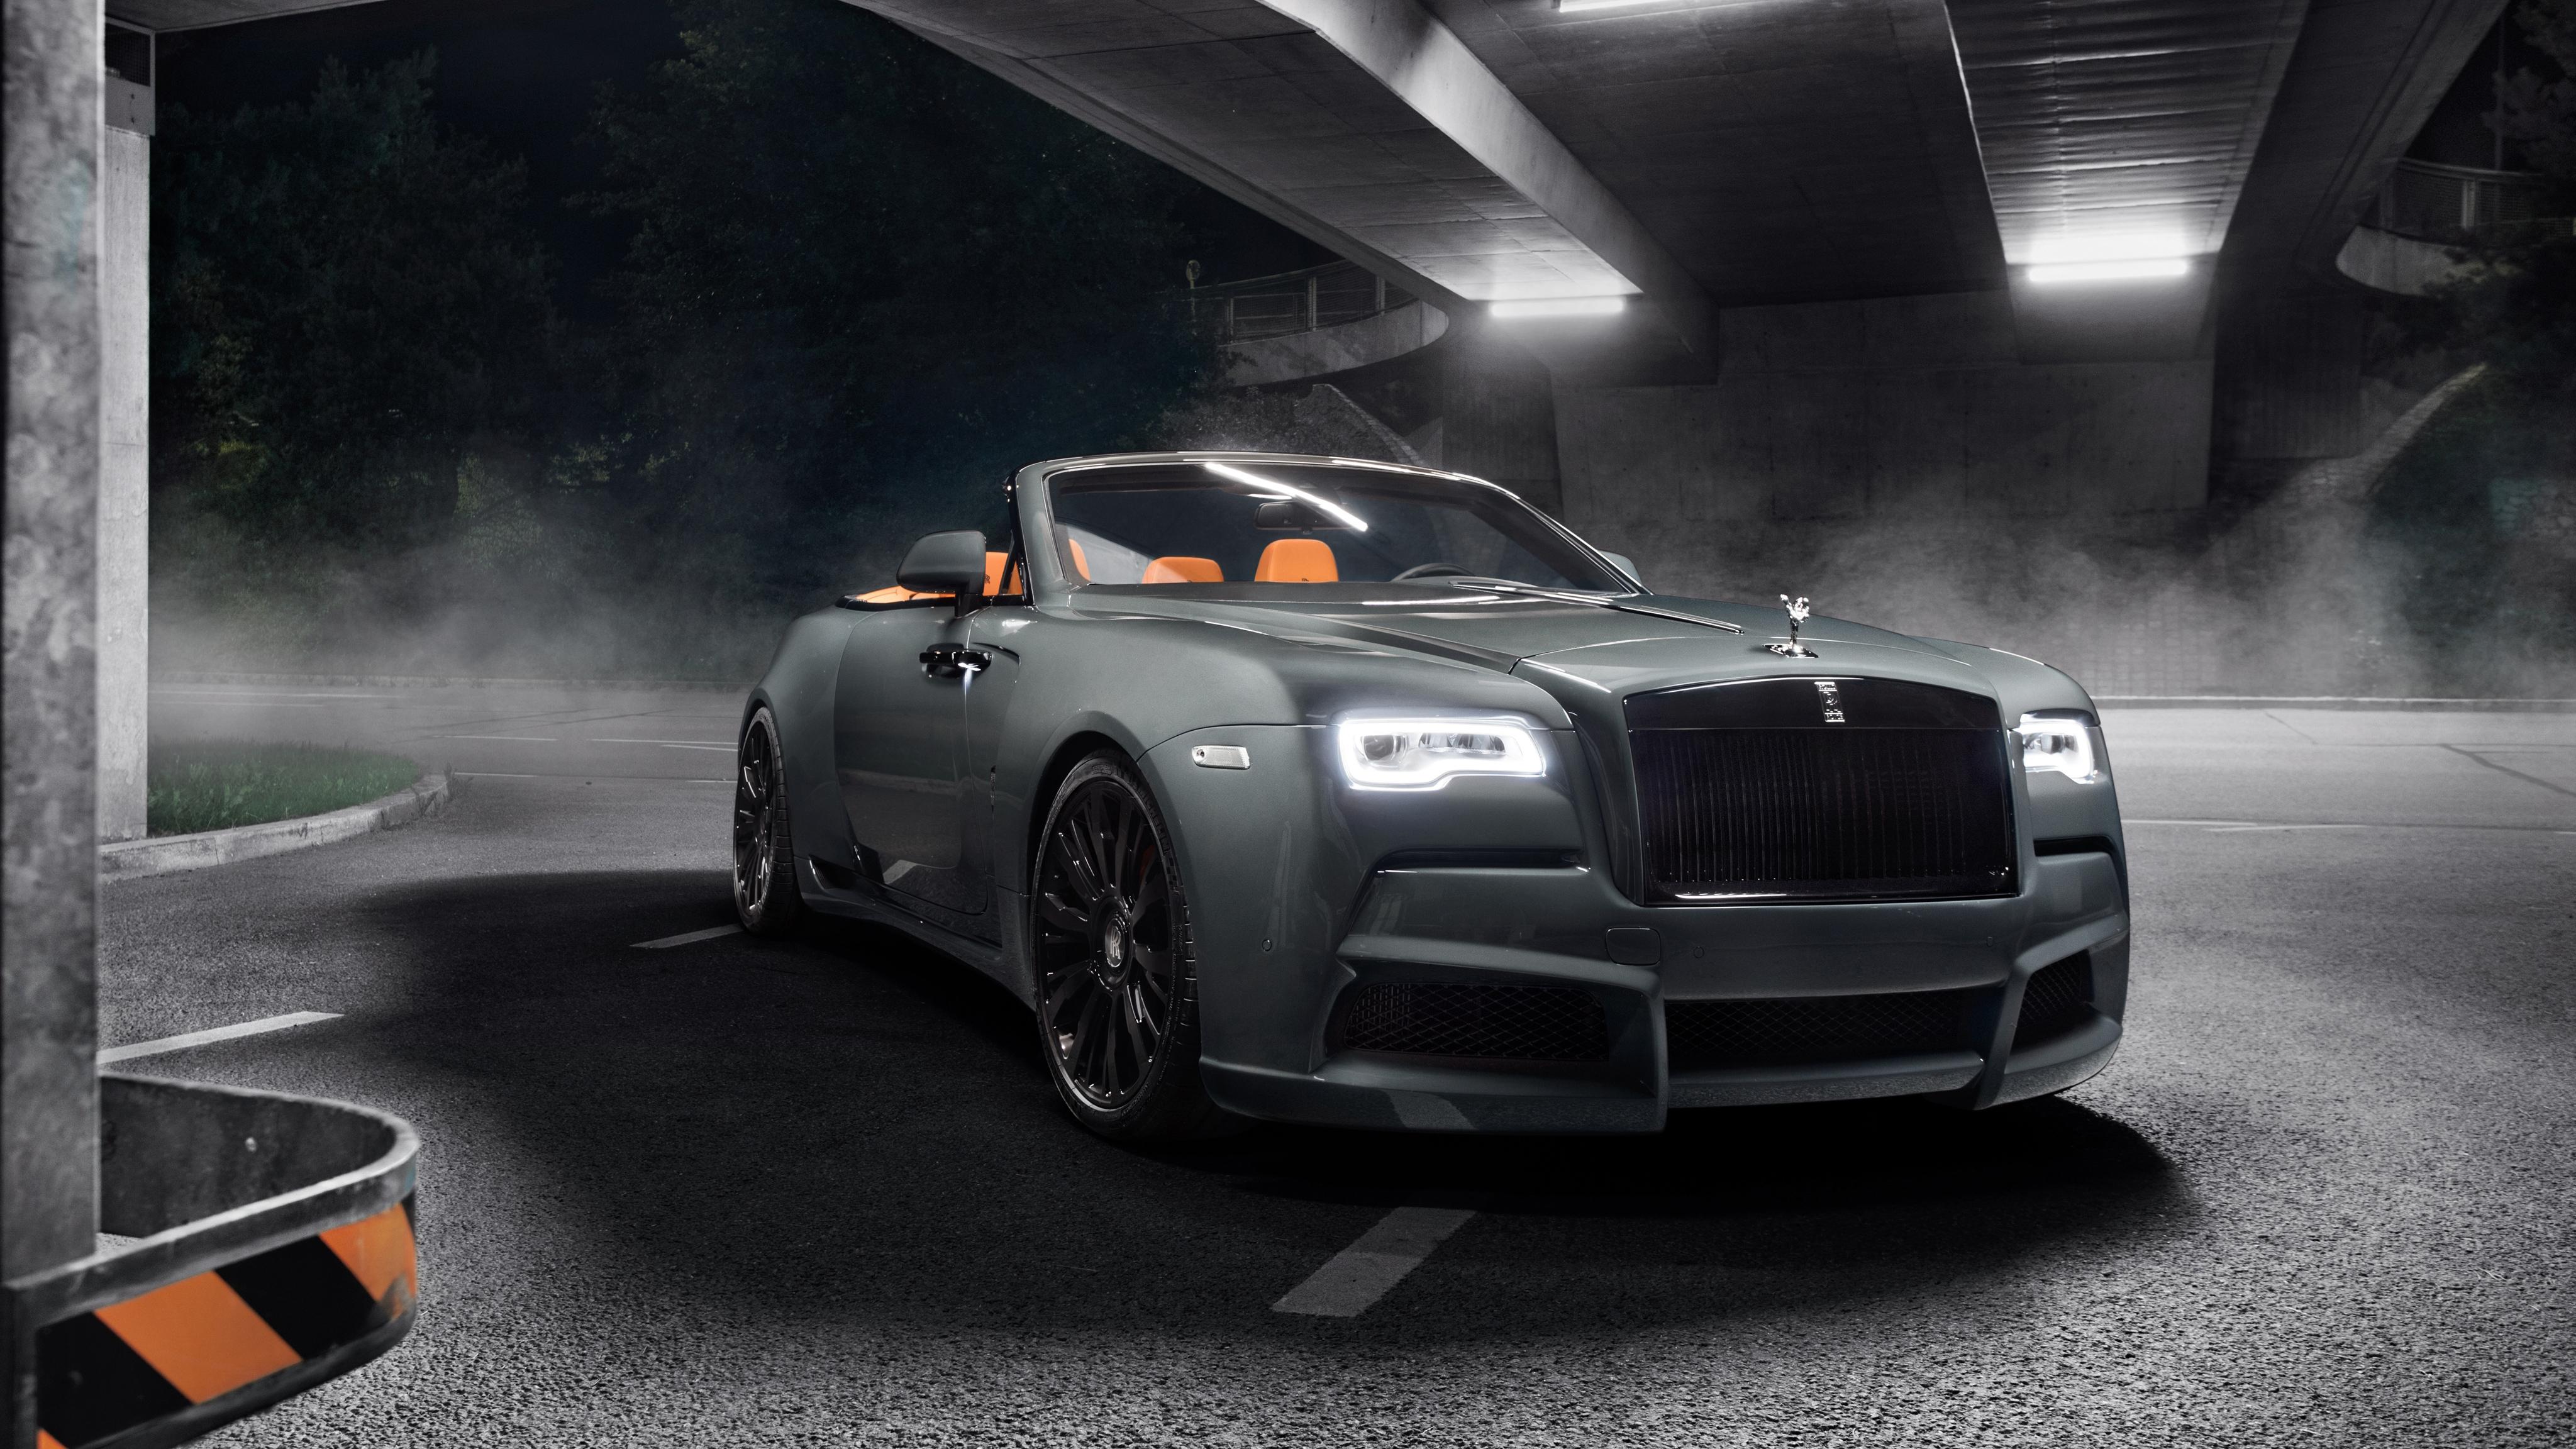 2018 Rolls Royce Dawn Overdose By Spofec 4K Wallpaper